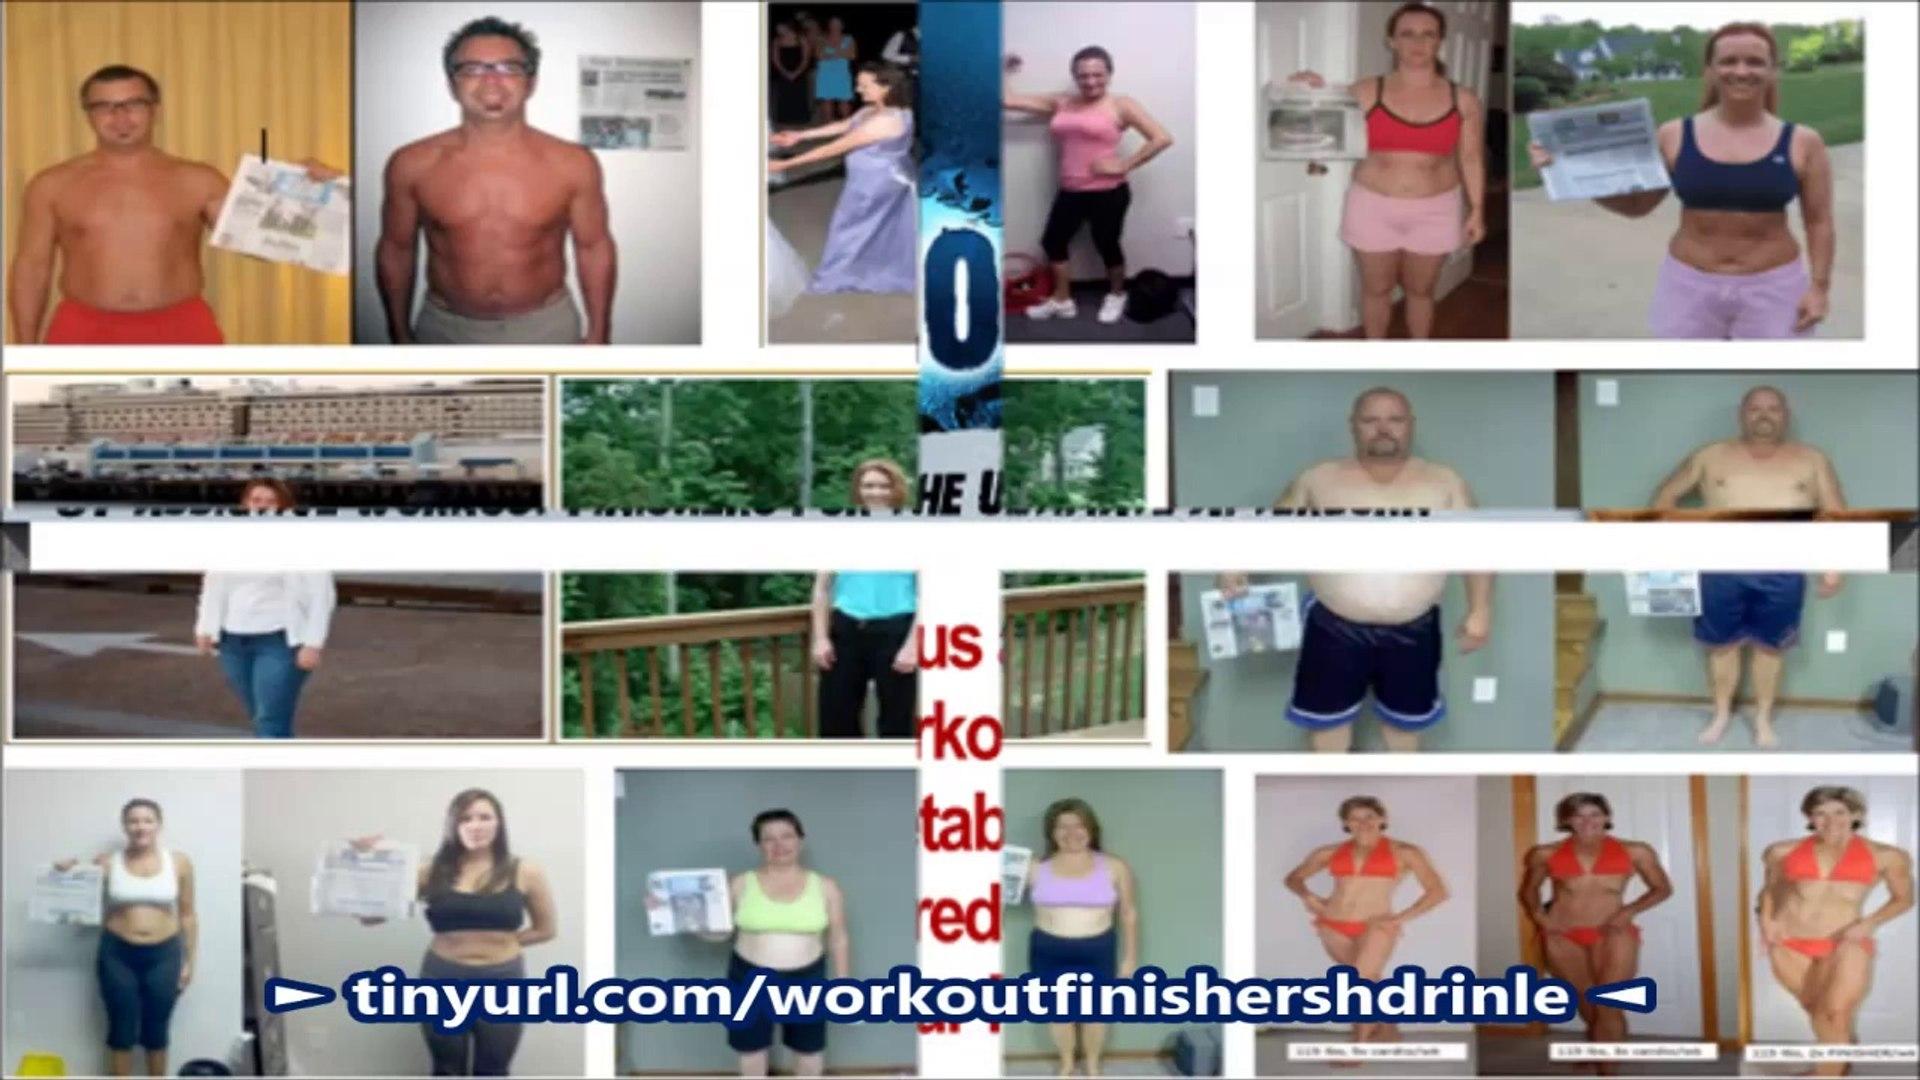 Workout Finishers 2.0 Download  Bodyweight Workout Finishers 2.0